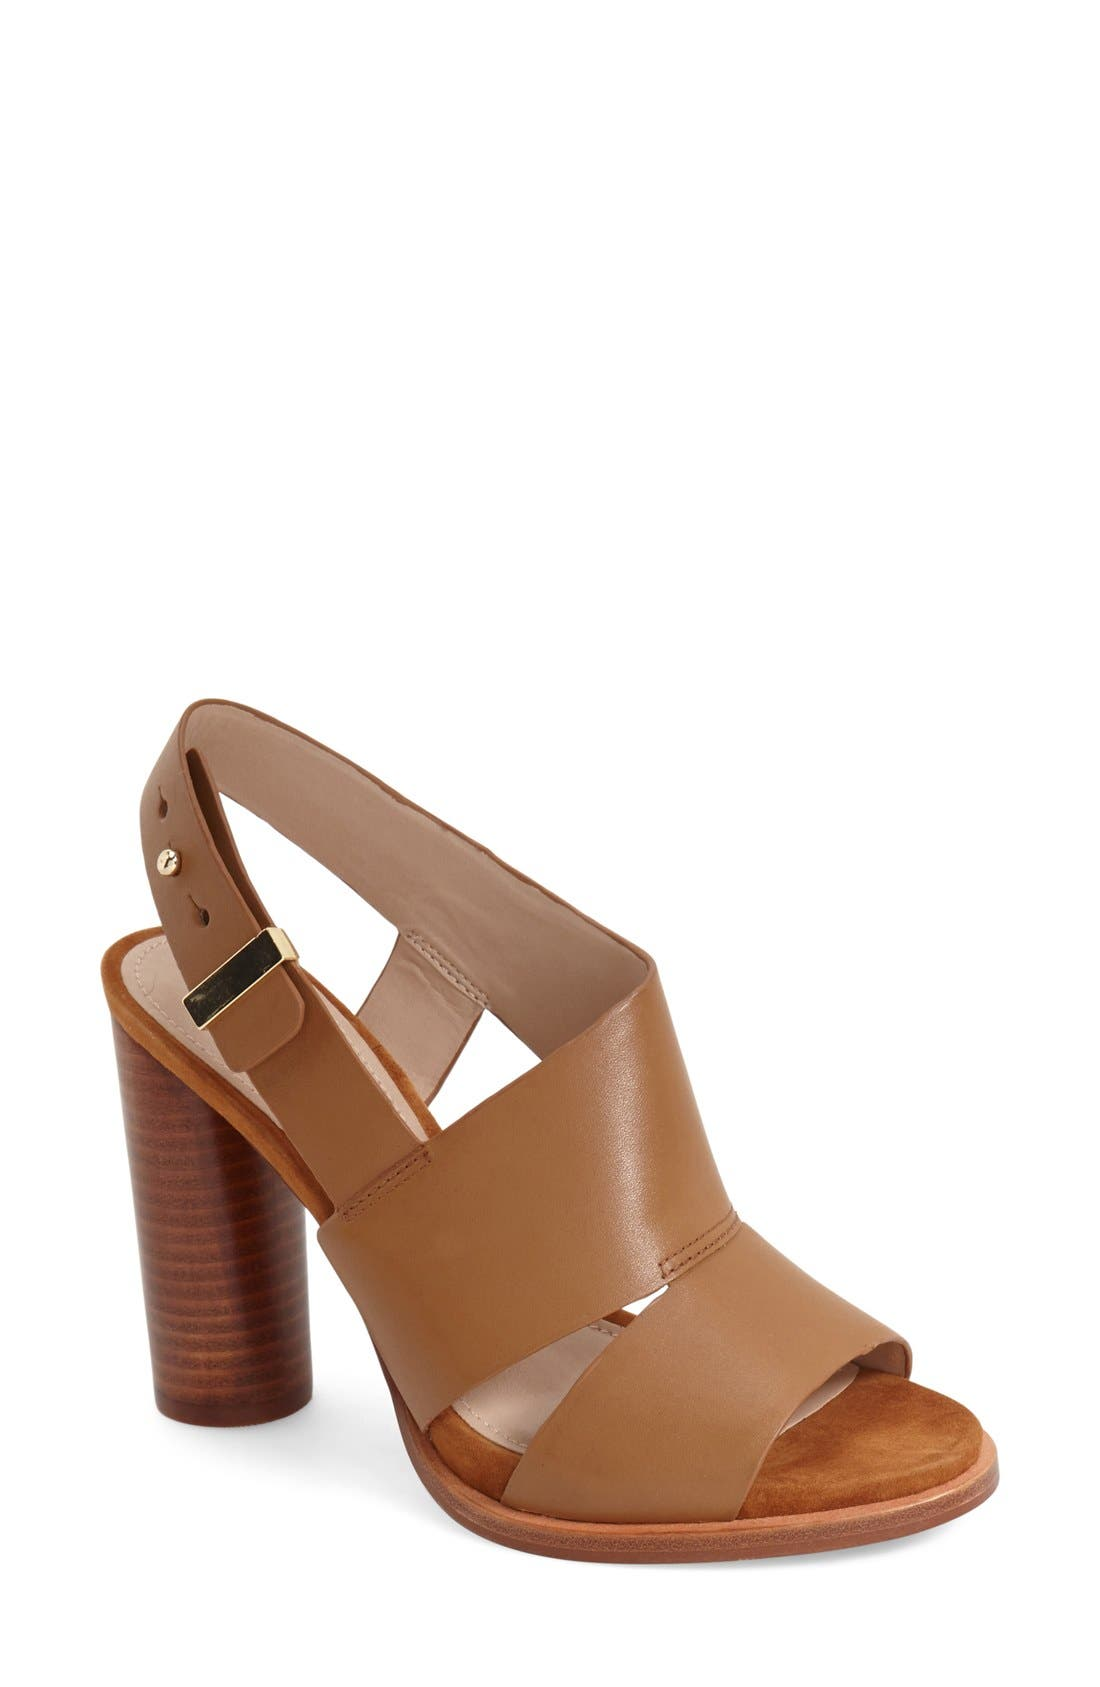 Main Image - French Connection 'Urlian' Sandal (Women)